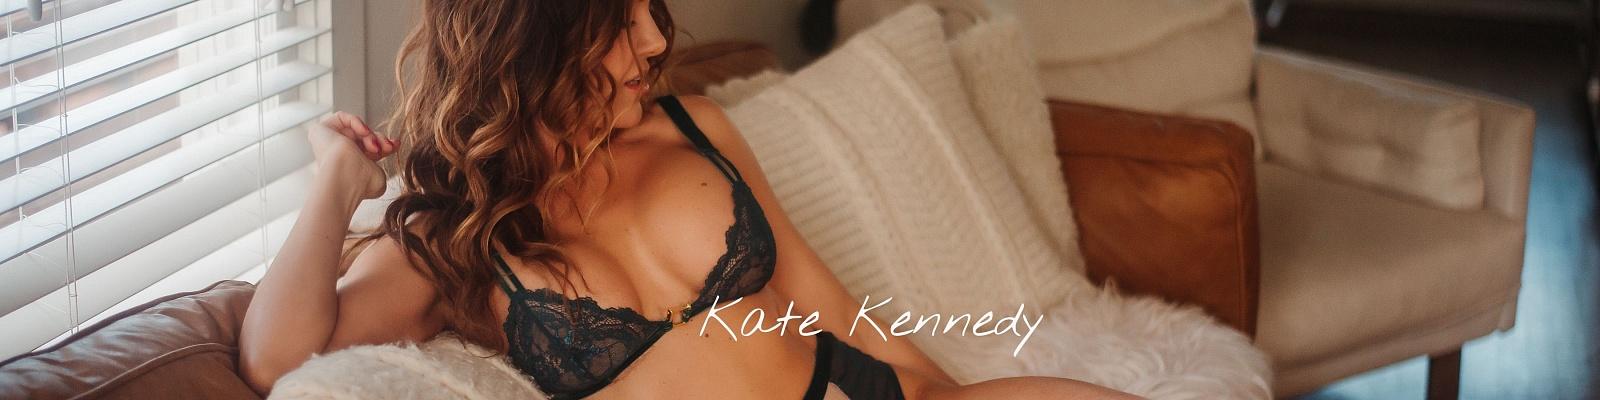 Kate Kennedy Escort